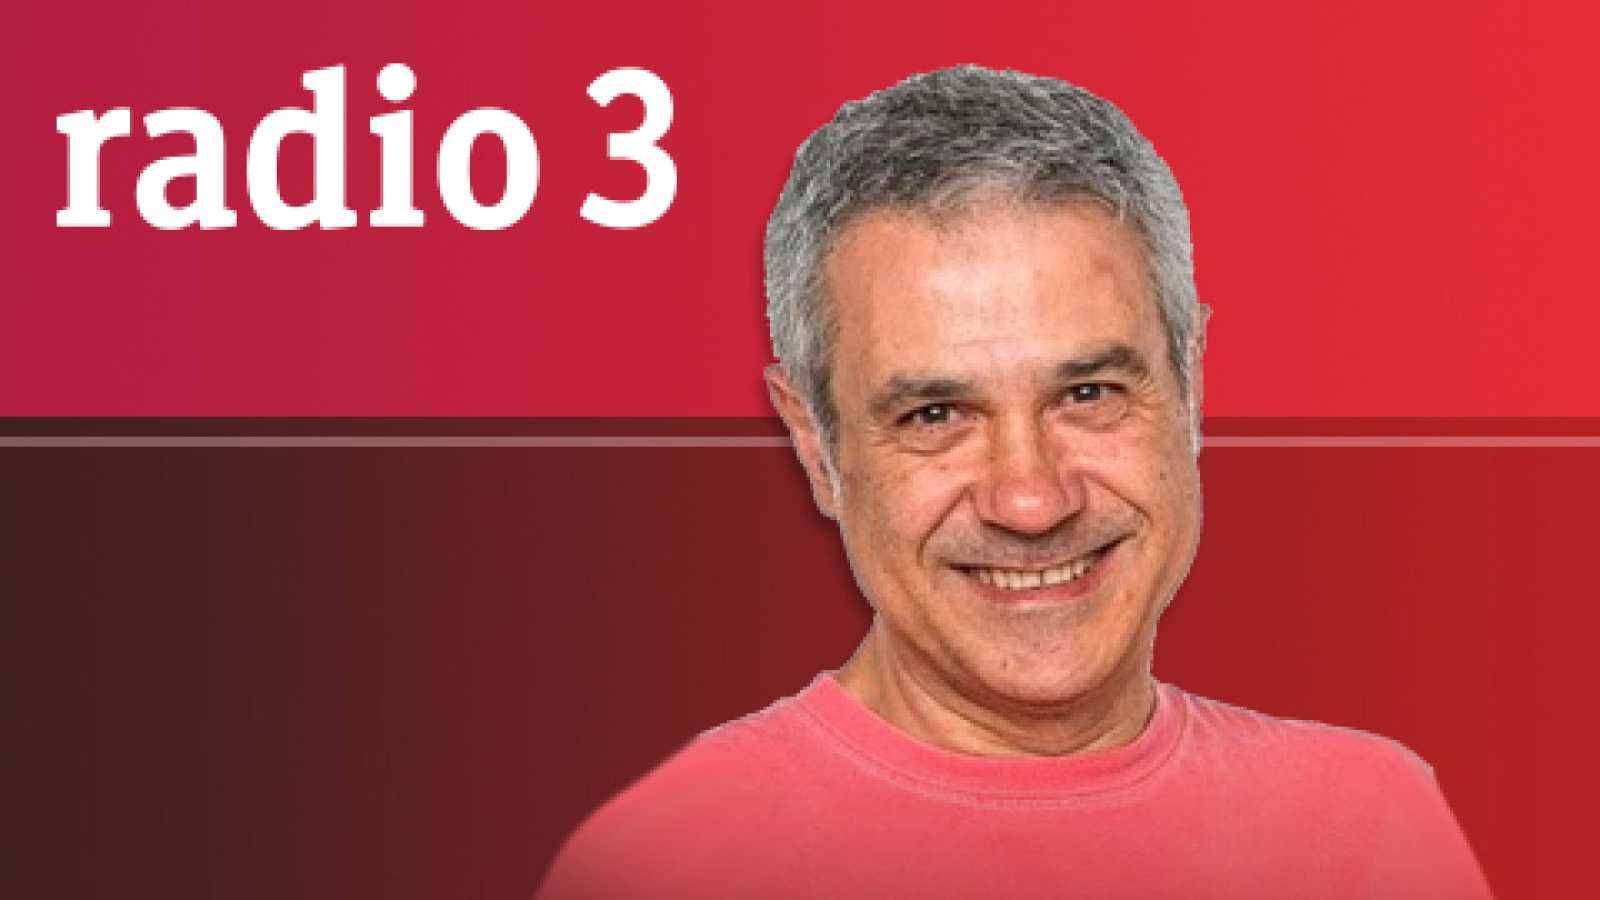 Duendeando - Se presenta Jerez - 14/03/21 - escuchar ahora